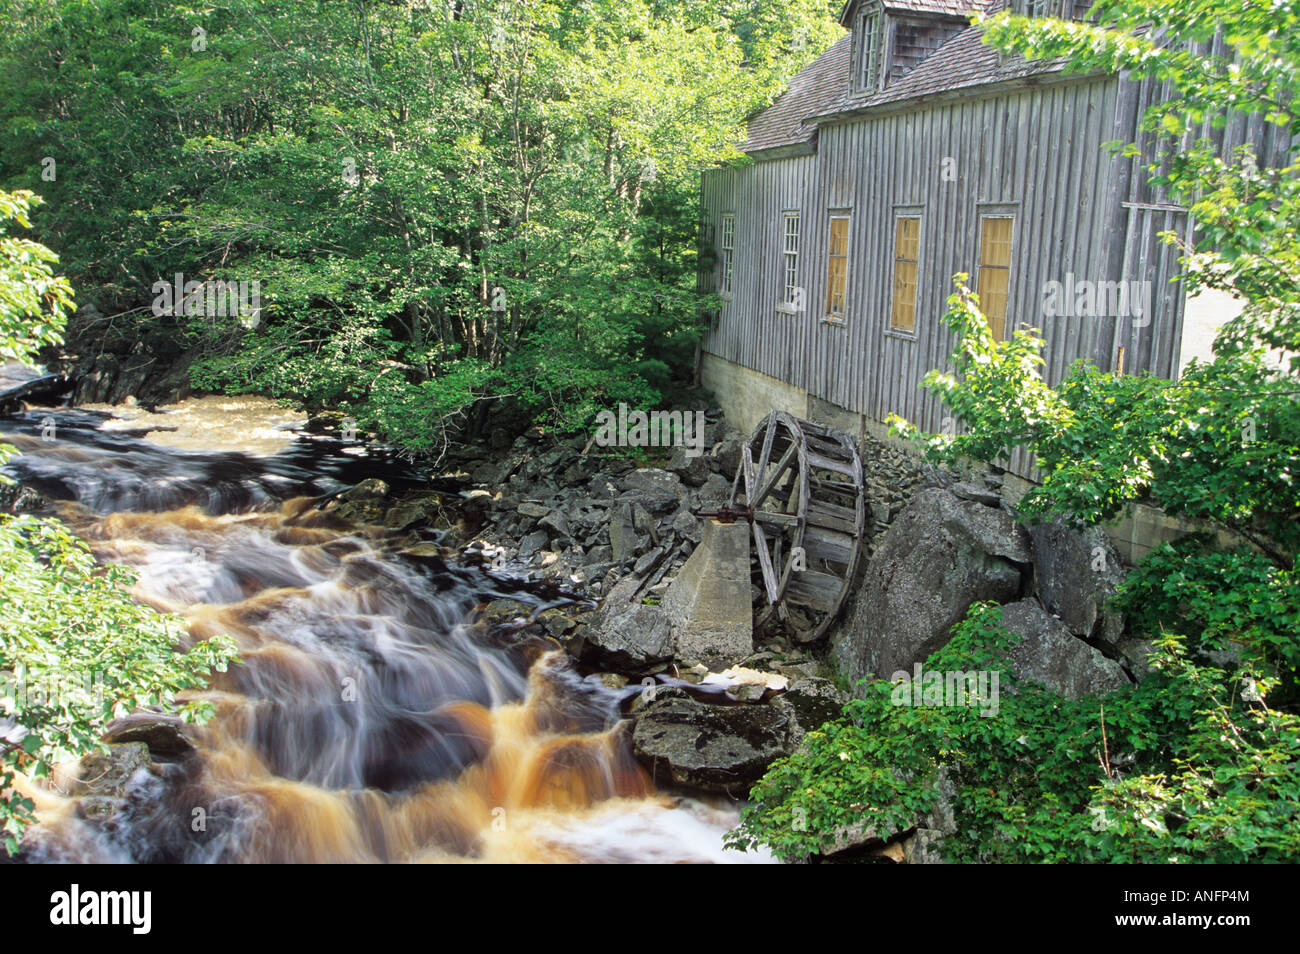 old mill, Sable River, Nova Scotia, Canada. - Stock Image